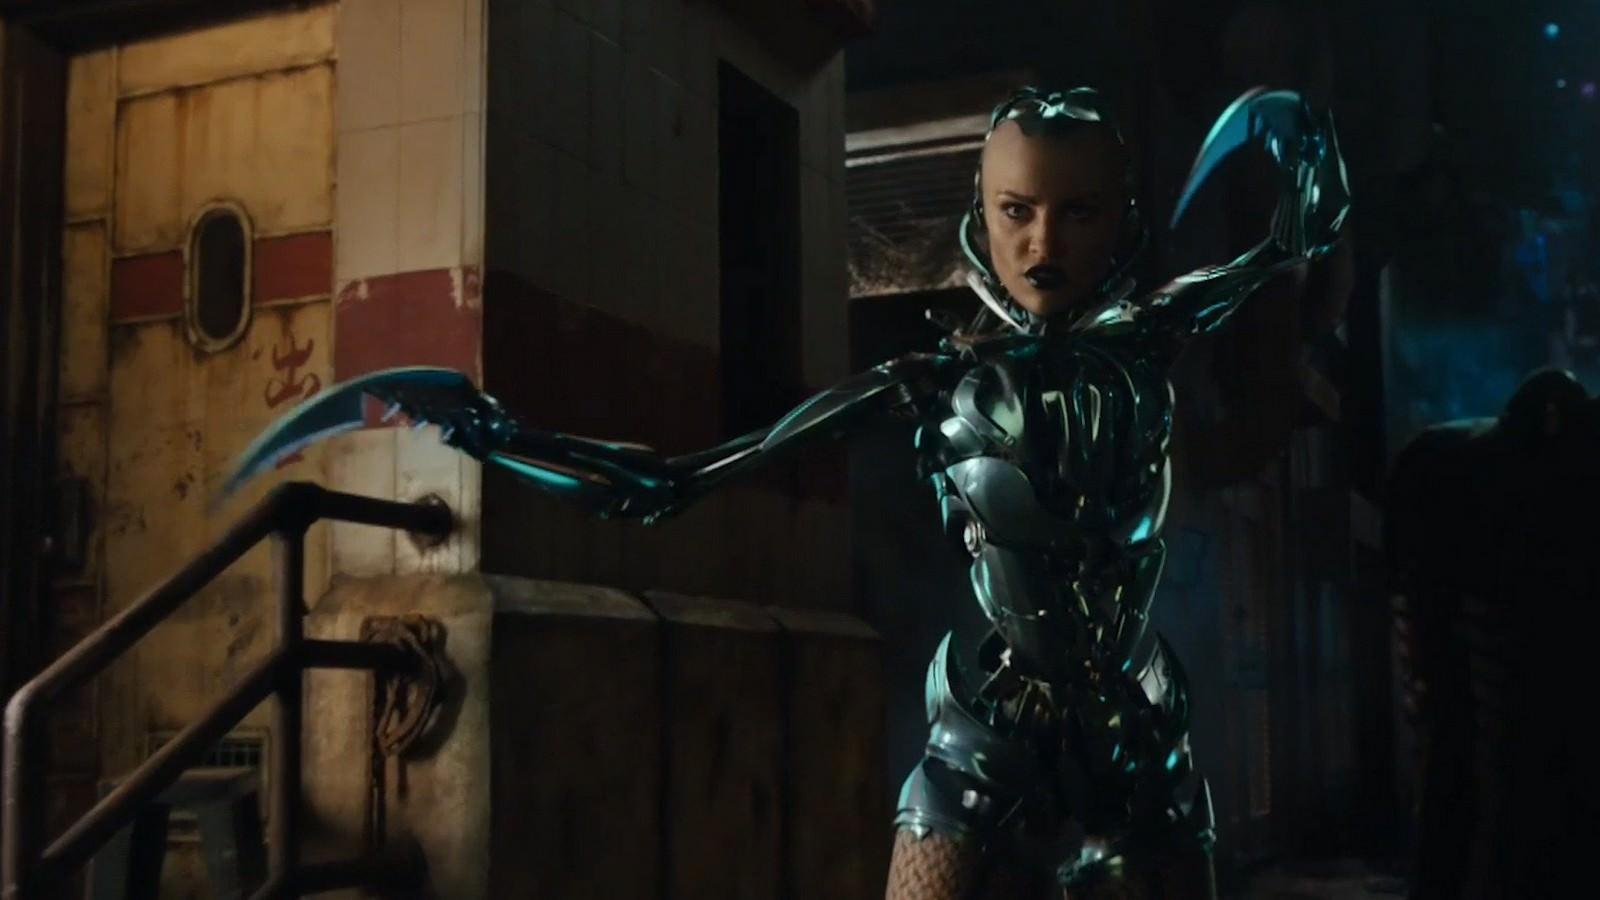 Movie, Alita: Battle Angel(美國, 2019年) / 艾莉塔:戰鬥天使(台灣) / 阿丽塔:战斗天使(中國) / 銃夢:戰鬥天使(香港), 電影角色與演員介紹